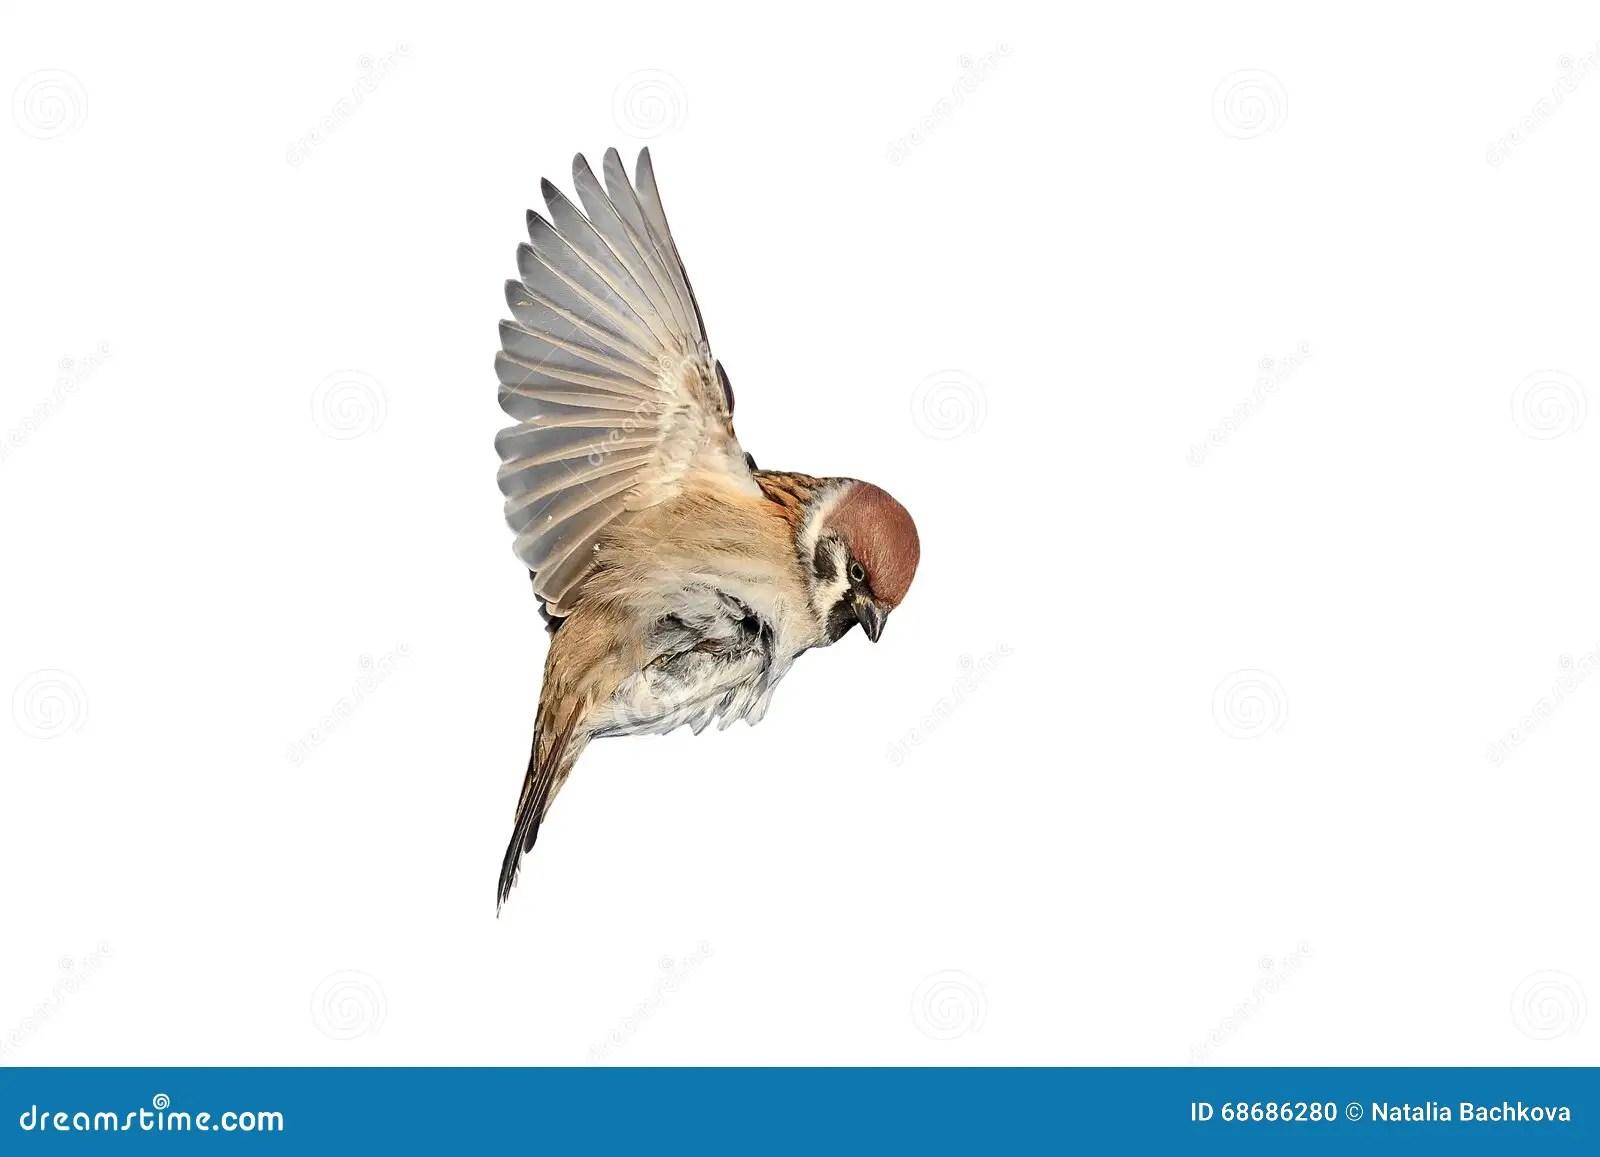 Che Quotes Wallpaper White Bird Wings Spread